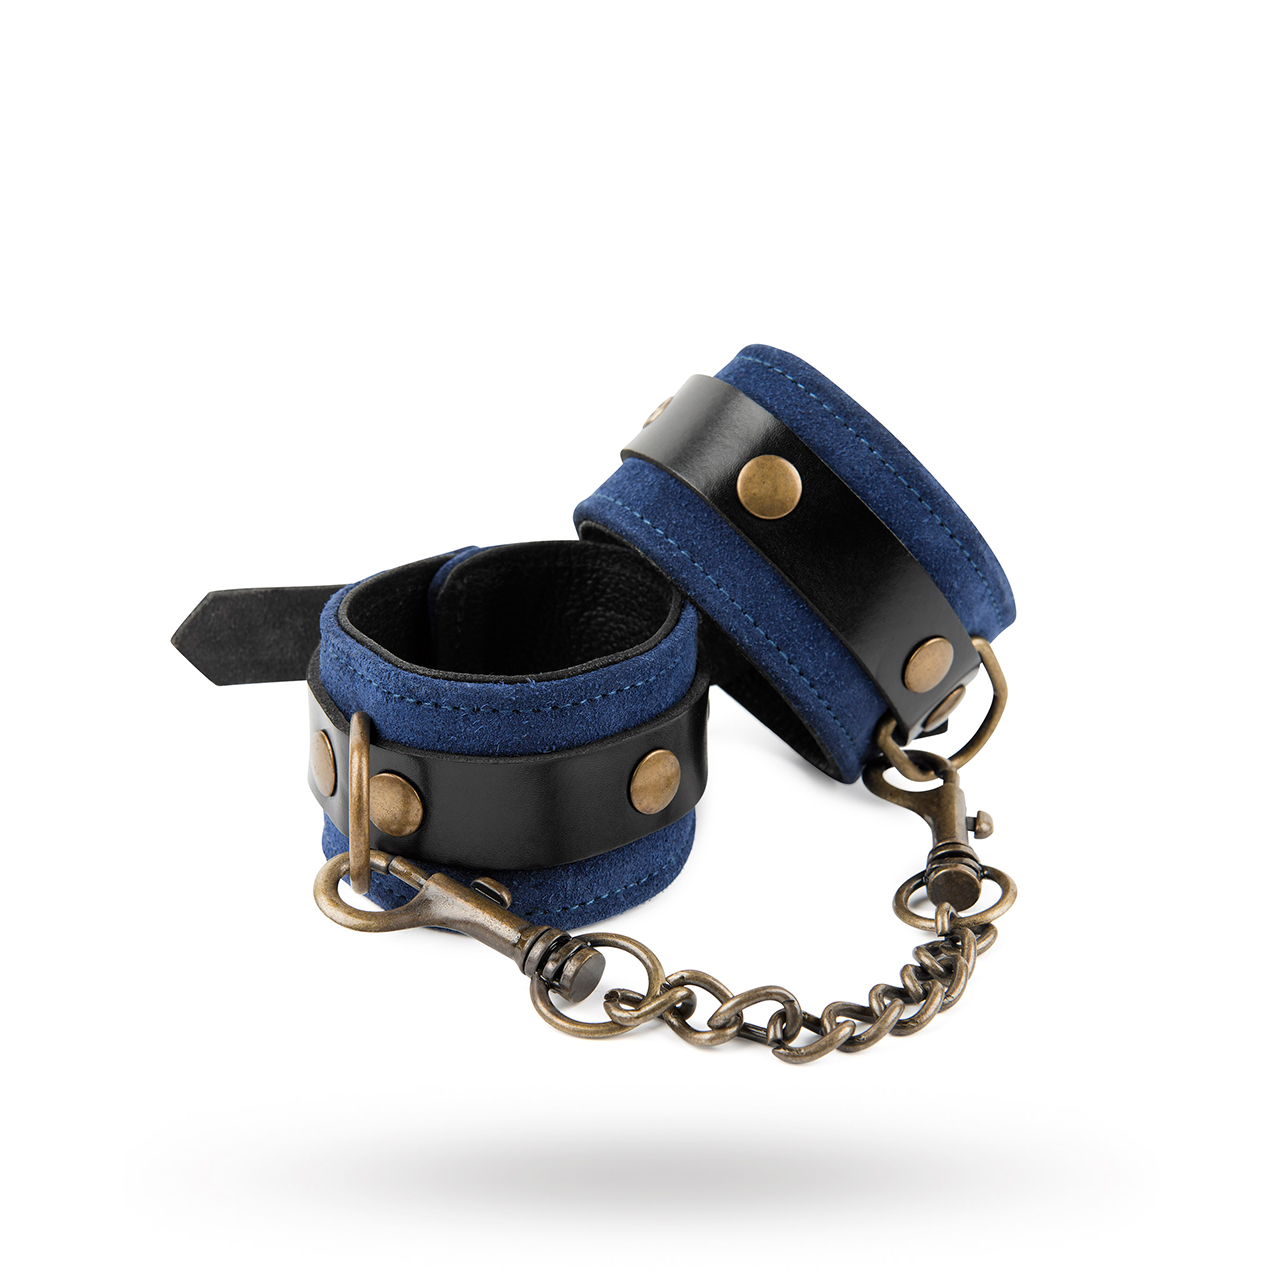 & Restrain Me - Luxury Blue Suede Wrist Cuffs | Brands, Please Be Kind Genuine Leather, INSPIRATION, SEXAKTIVITETER, Sex som i Fifty Shades of Grey, SEXLEKSAKER, BONDAGE & FETISH, Bojor & Fängsel | Intimast.se - Sexleksaker